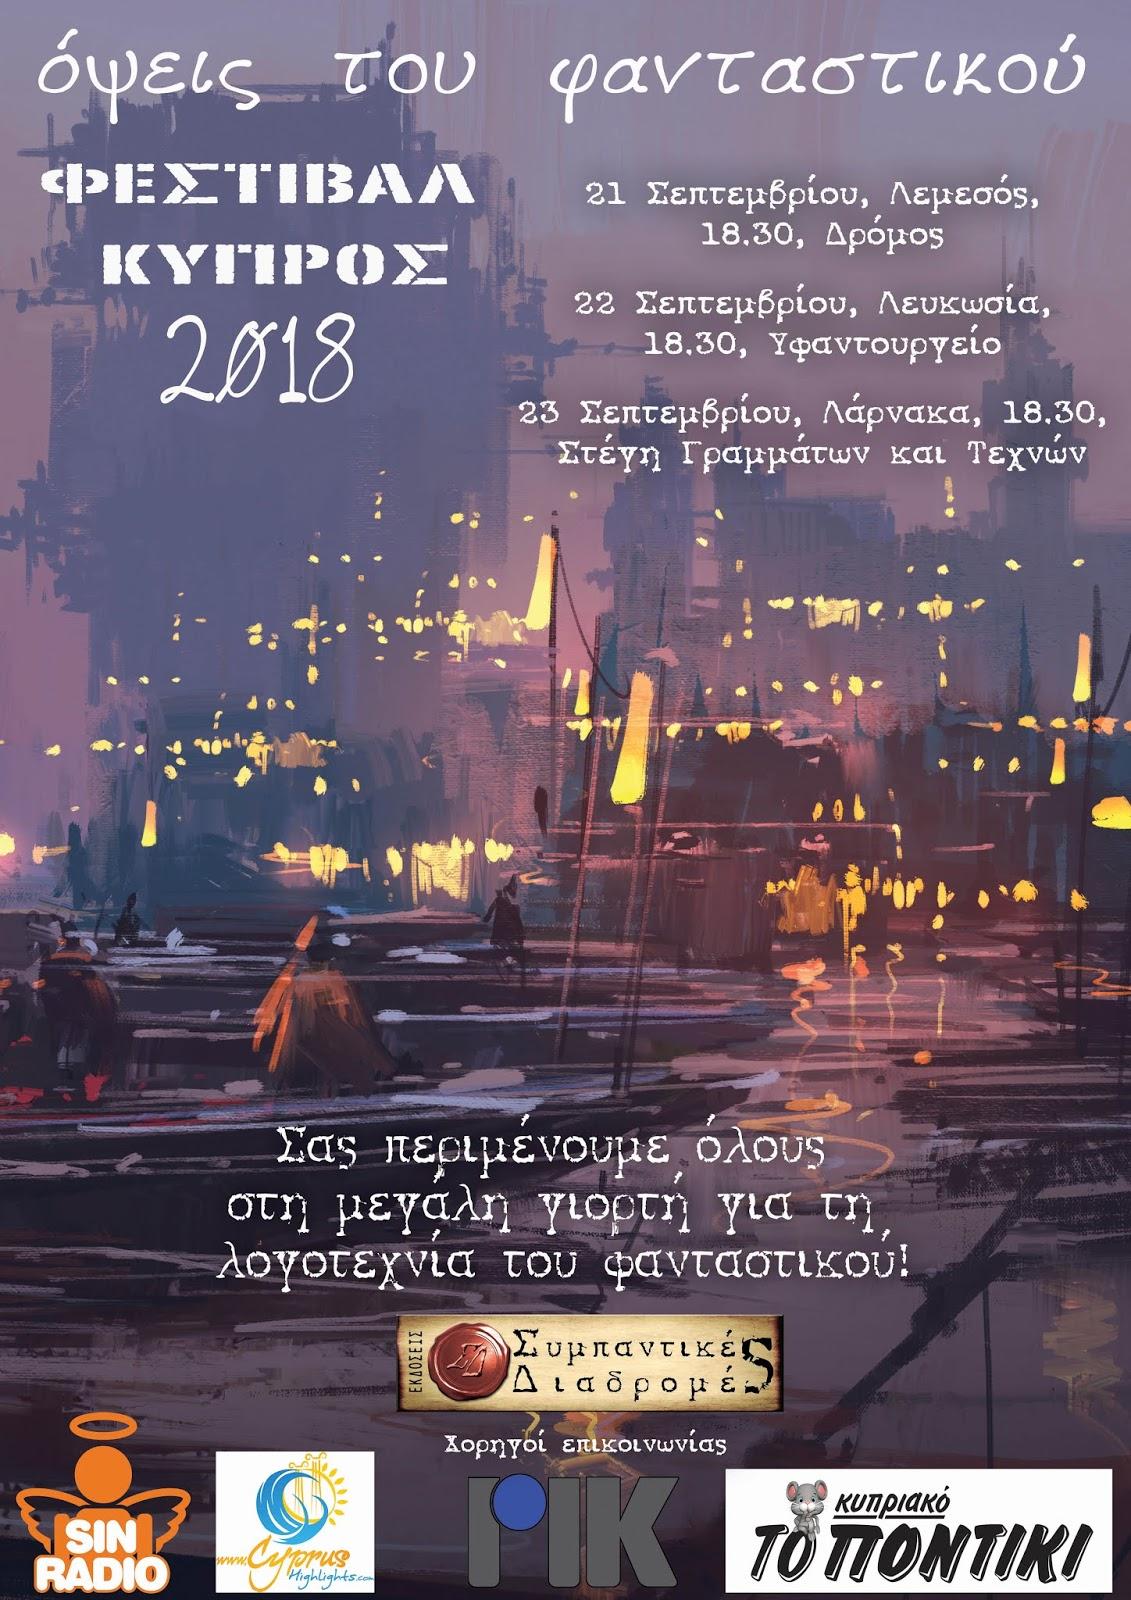 b8162912d5a Εκδόσεις ΣΥΜΠΑΝΤΙΚΕΣ ΔΙΑΔΡΟΜΕΣ: Όψεις του Φανταστικού 2018 – Κύπρος ...